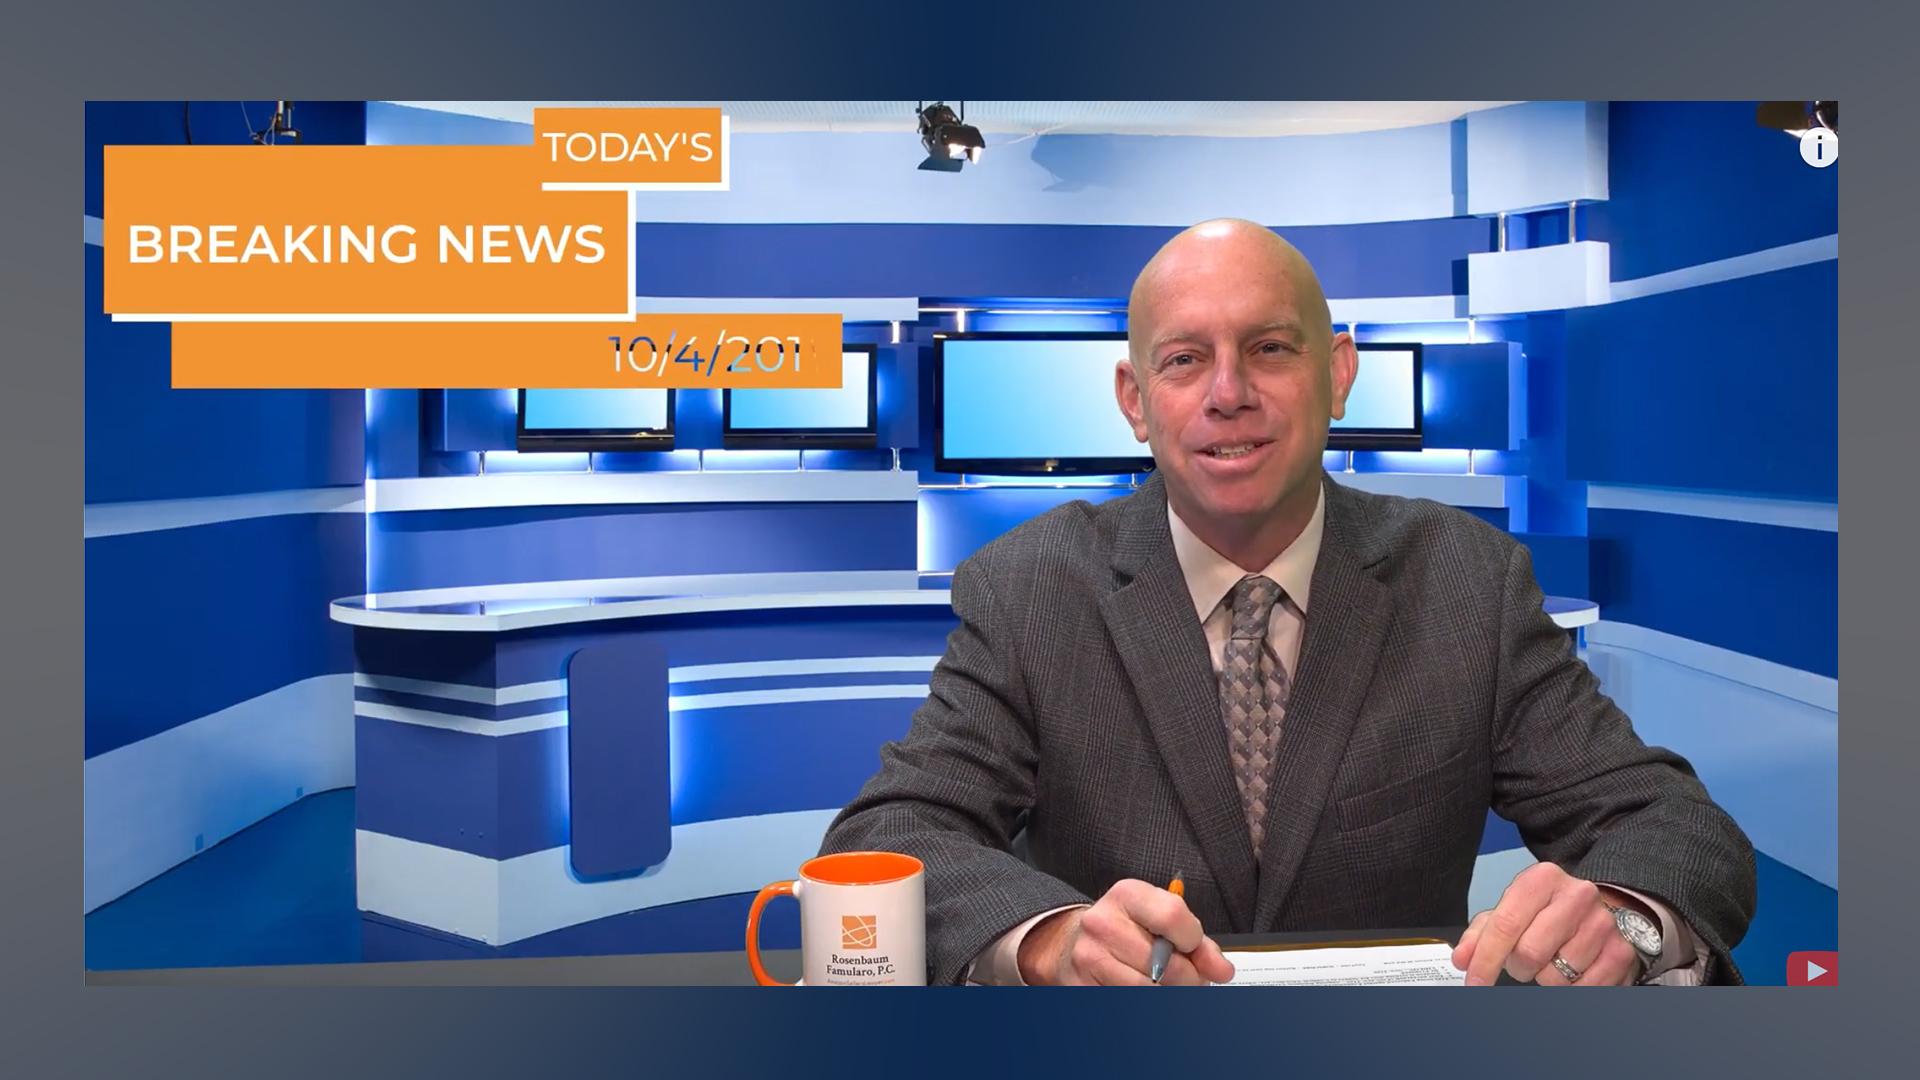 Amazon Sellers' News 10-4-19 with CJ Rosenbaum